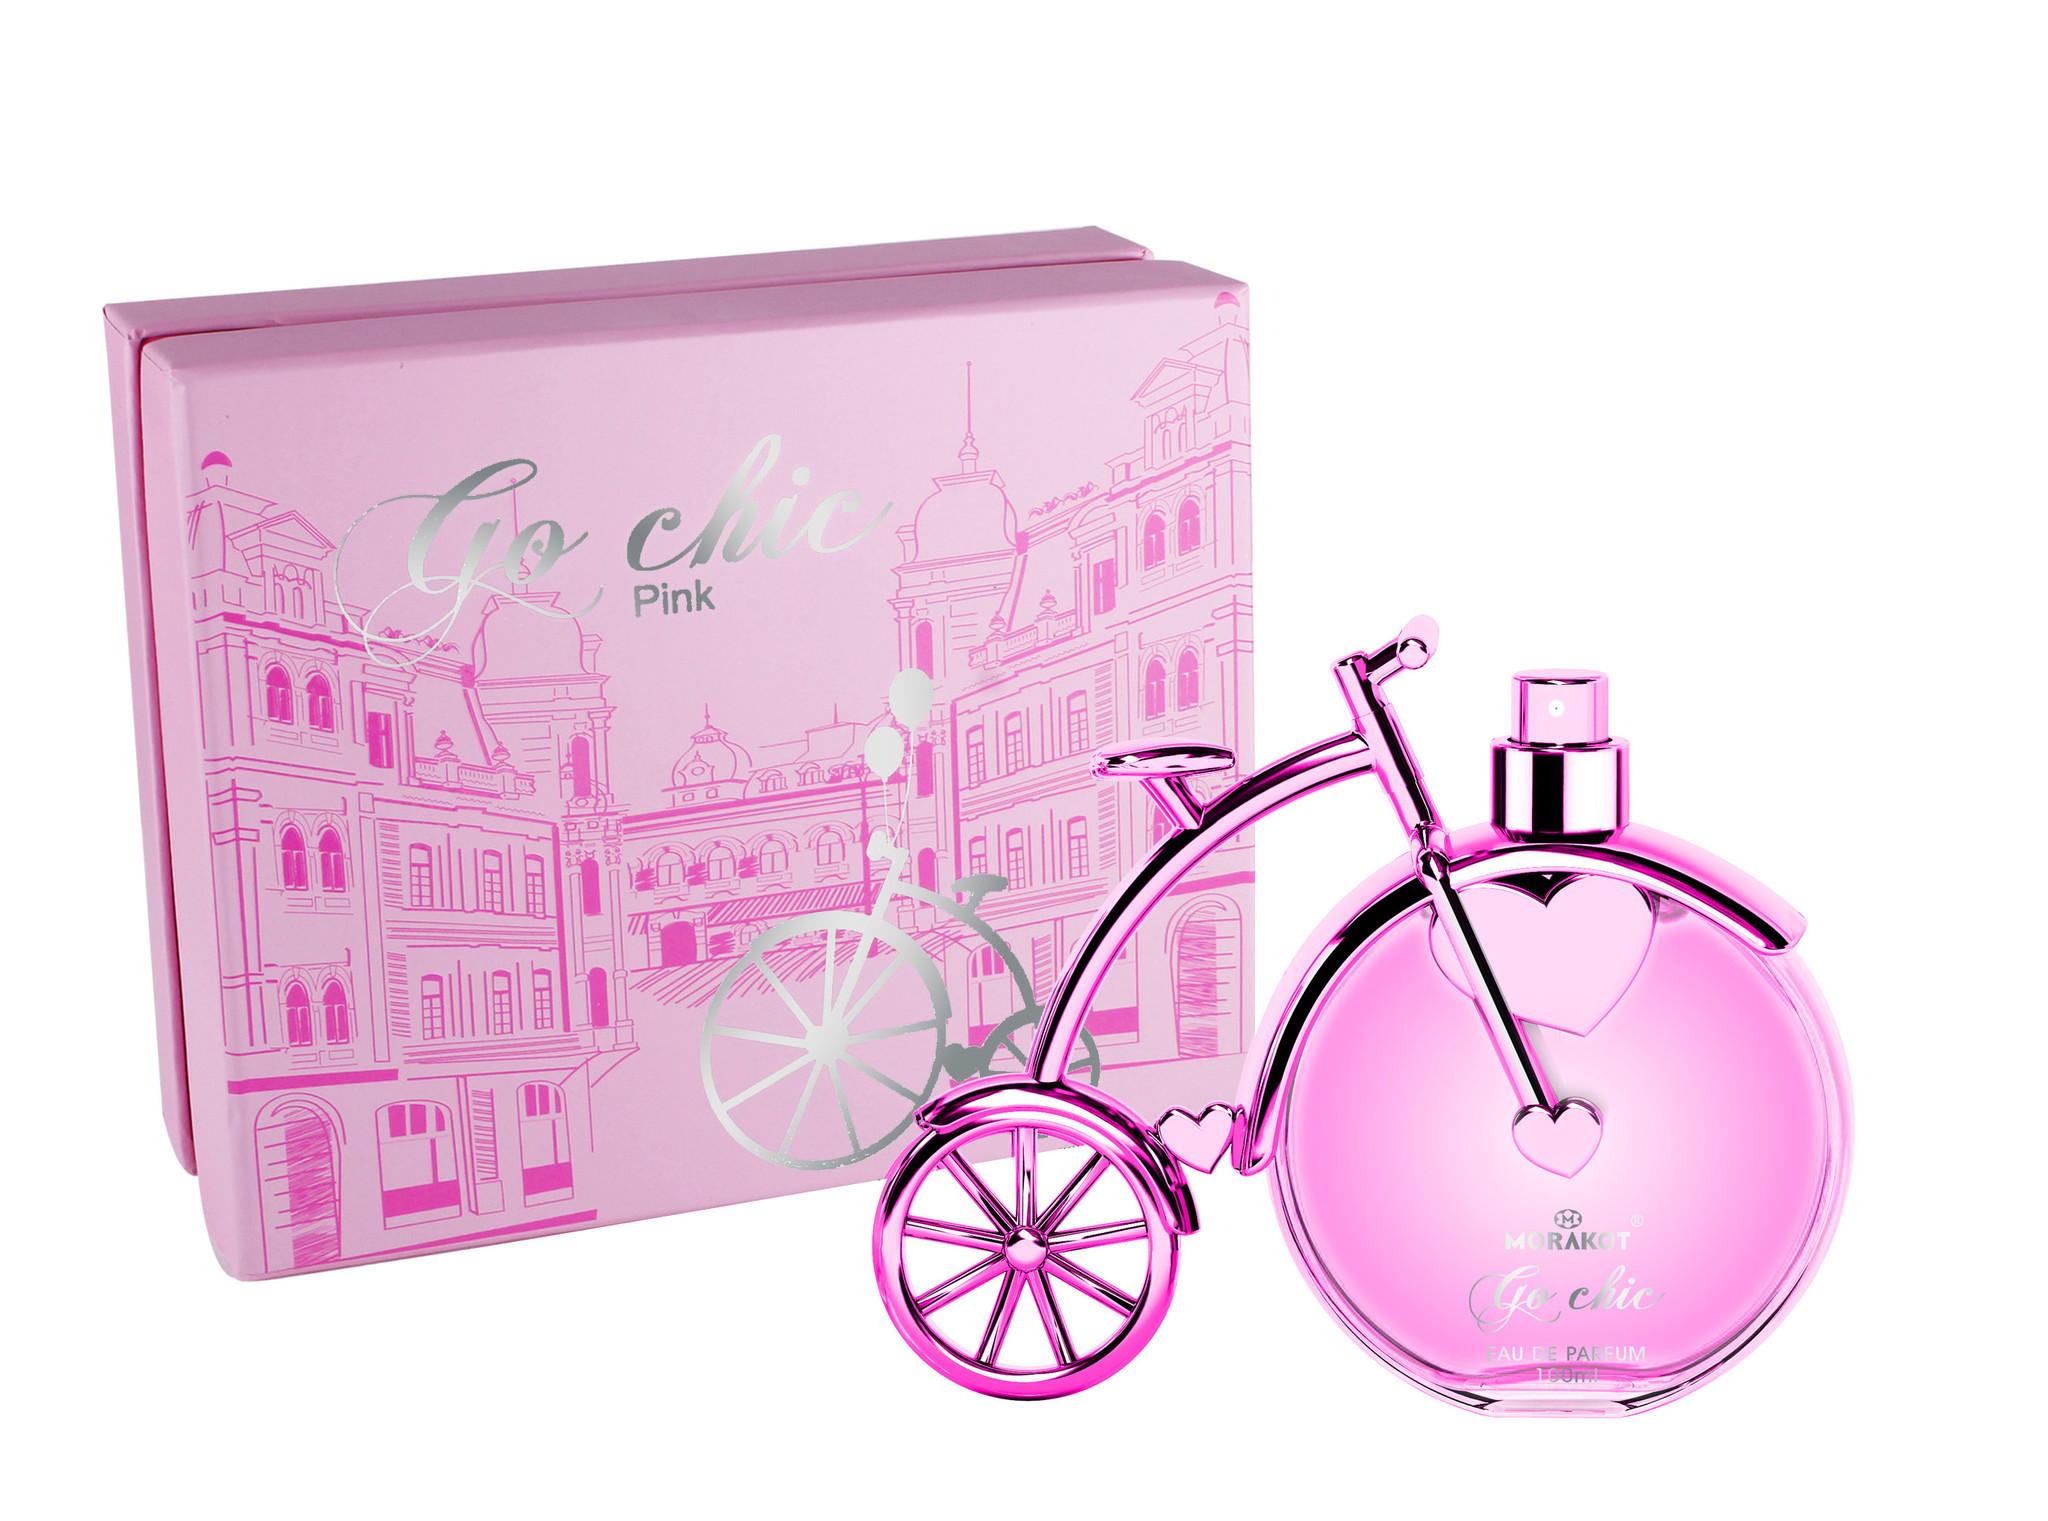 Tiverton Go chic pink EDP 100 ml | Euro parfums